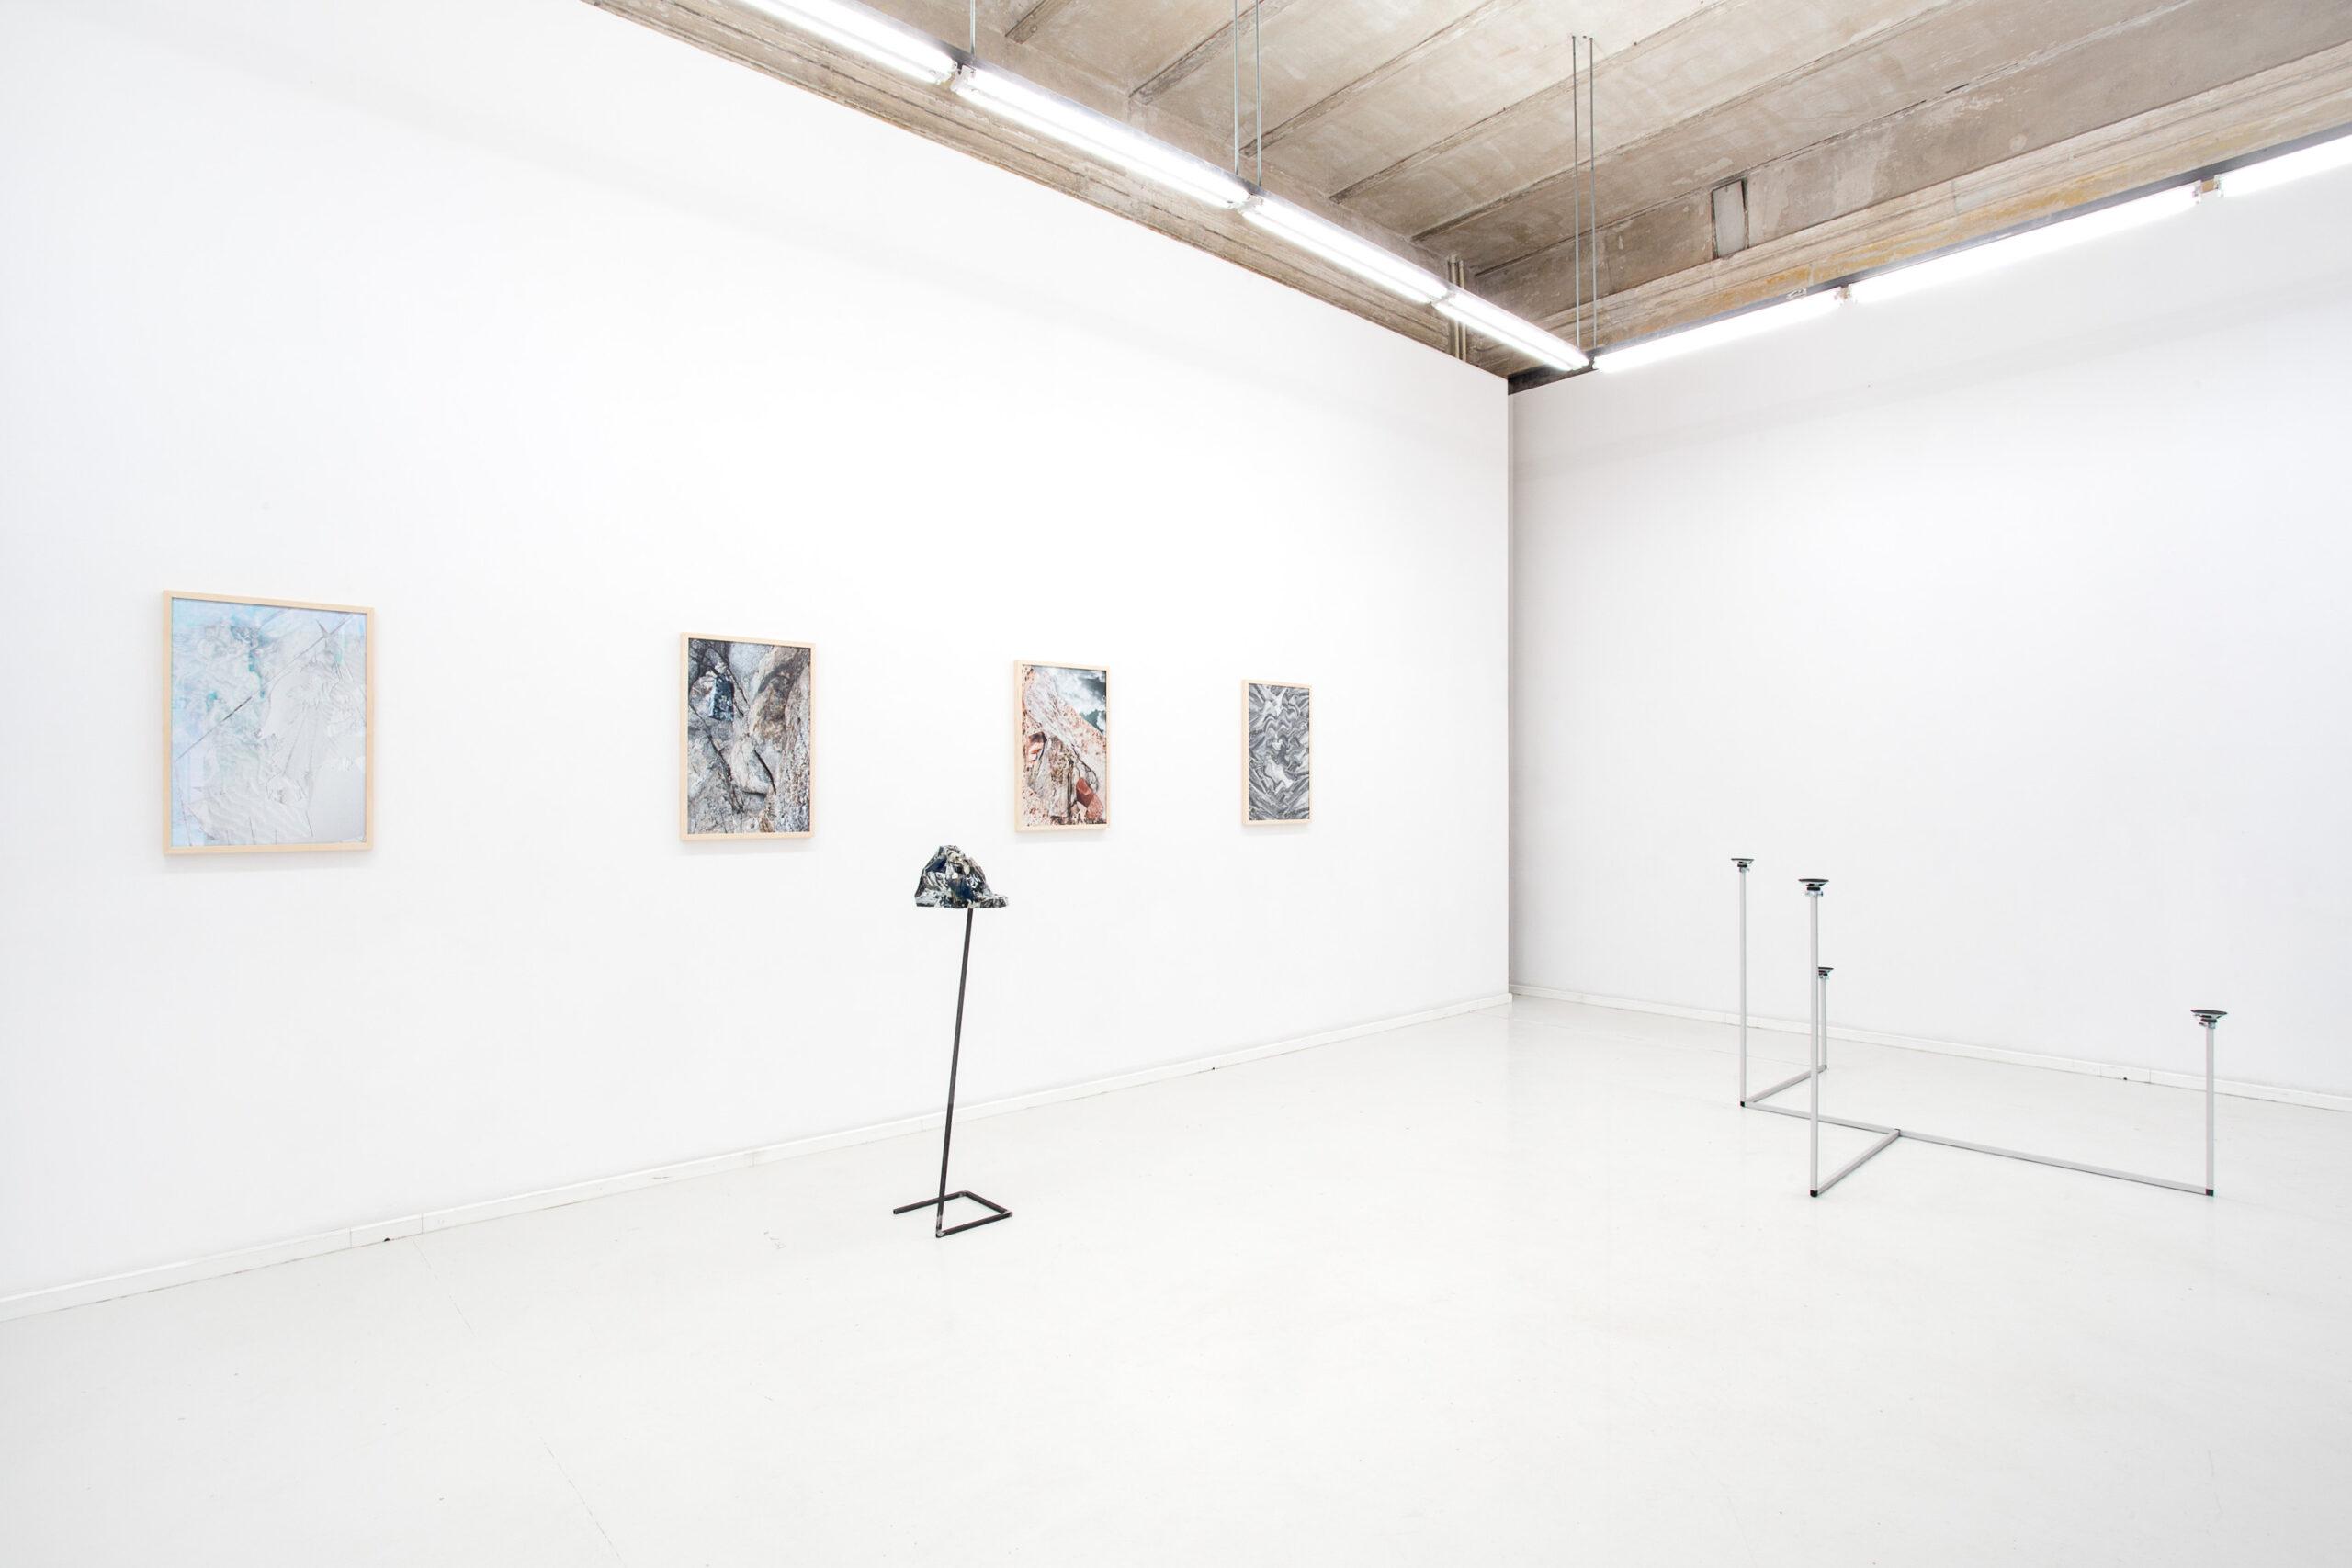 Jacek Doroszenko - Sound installation - Sculpture - Exhibition 01